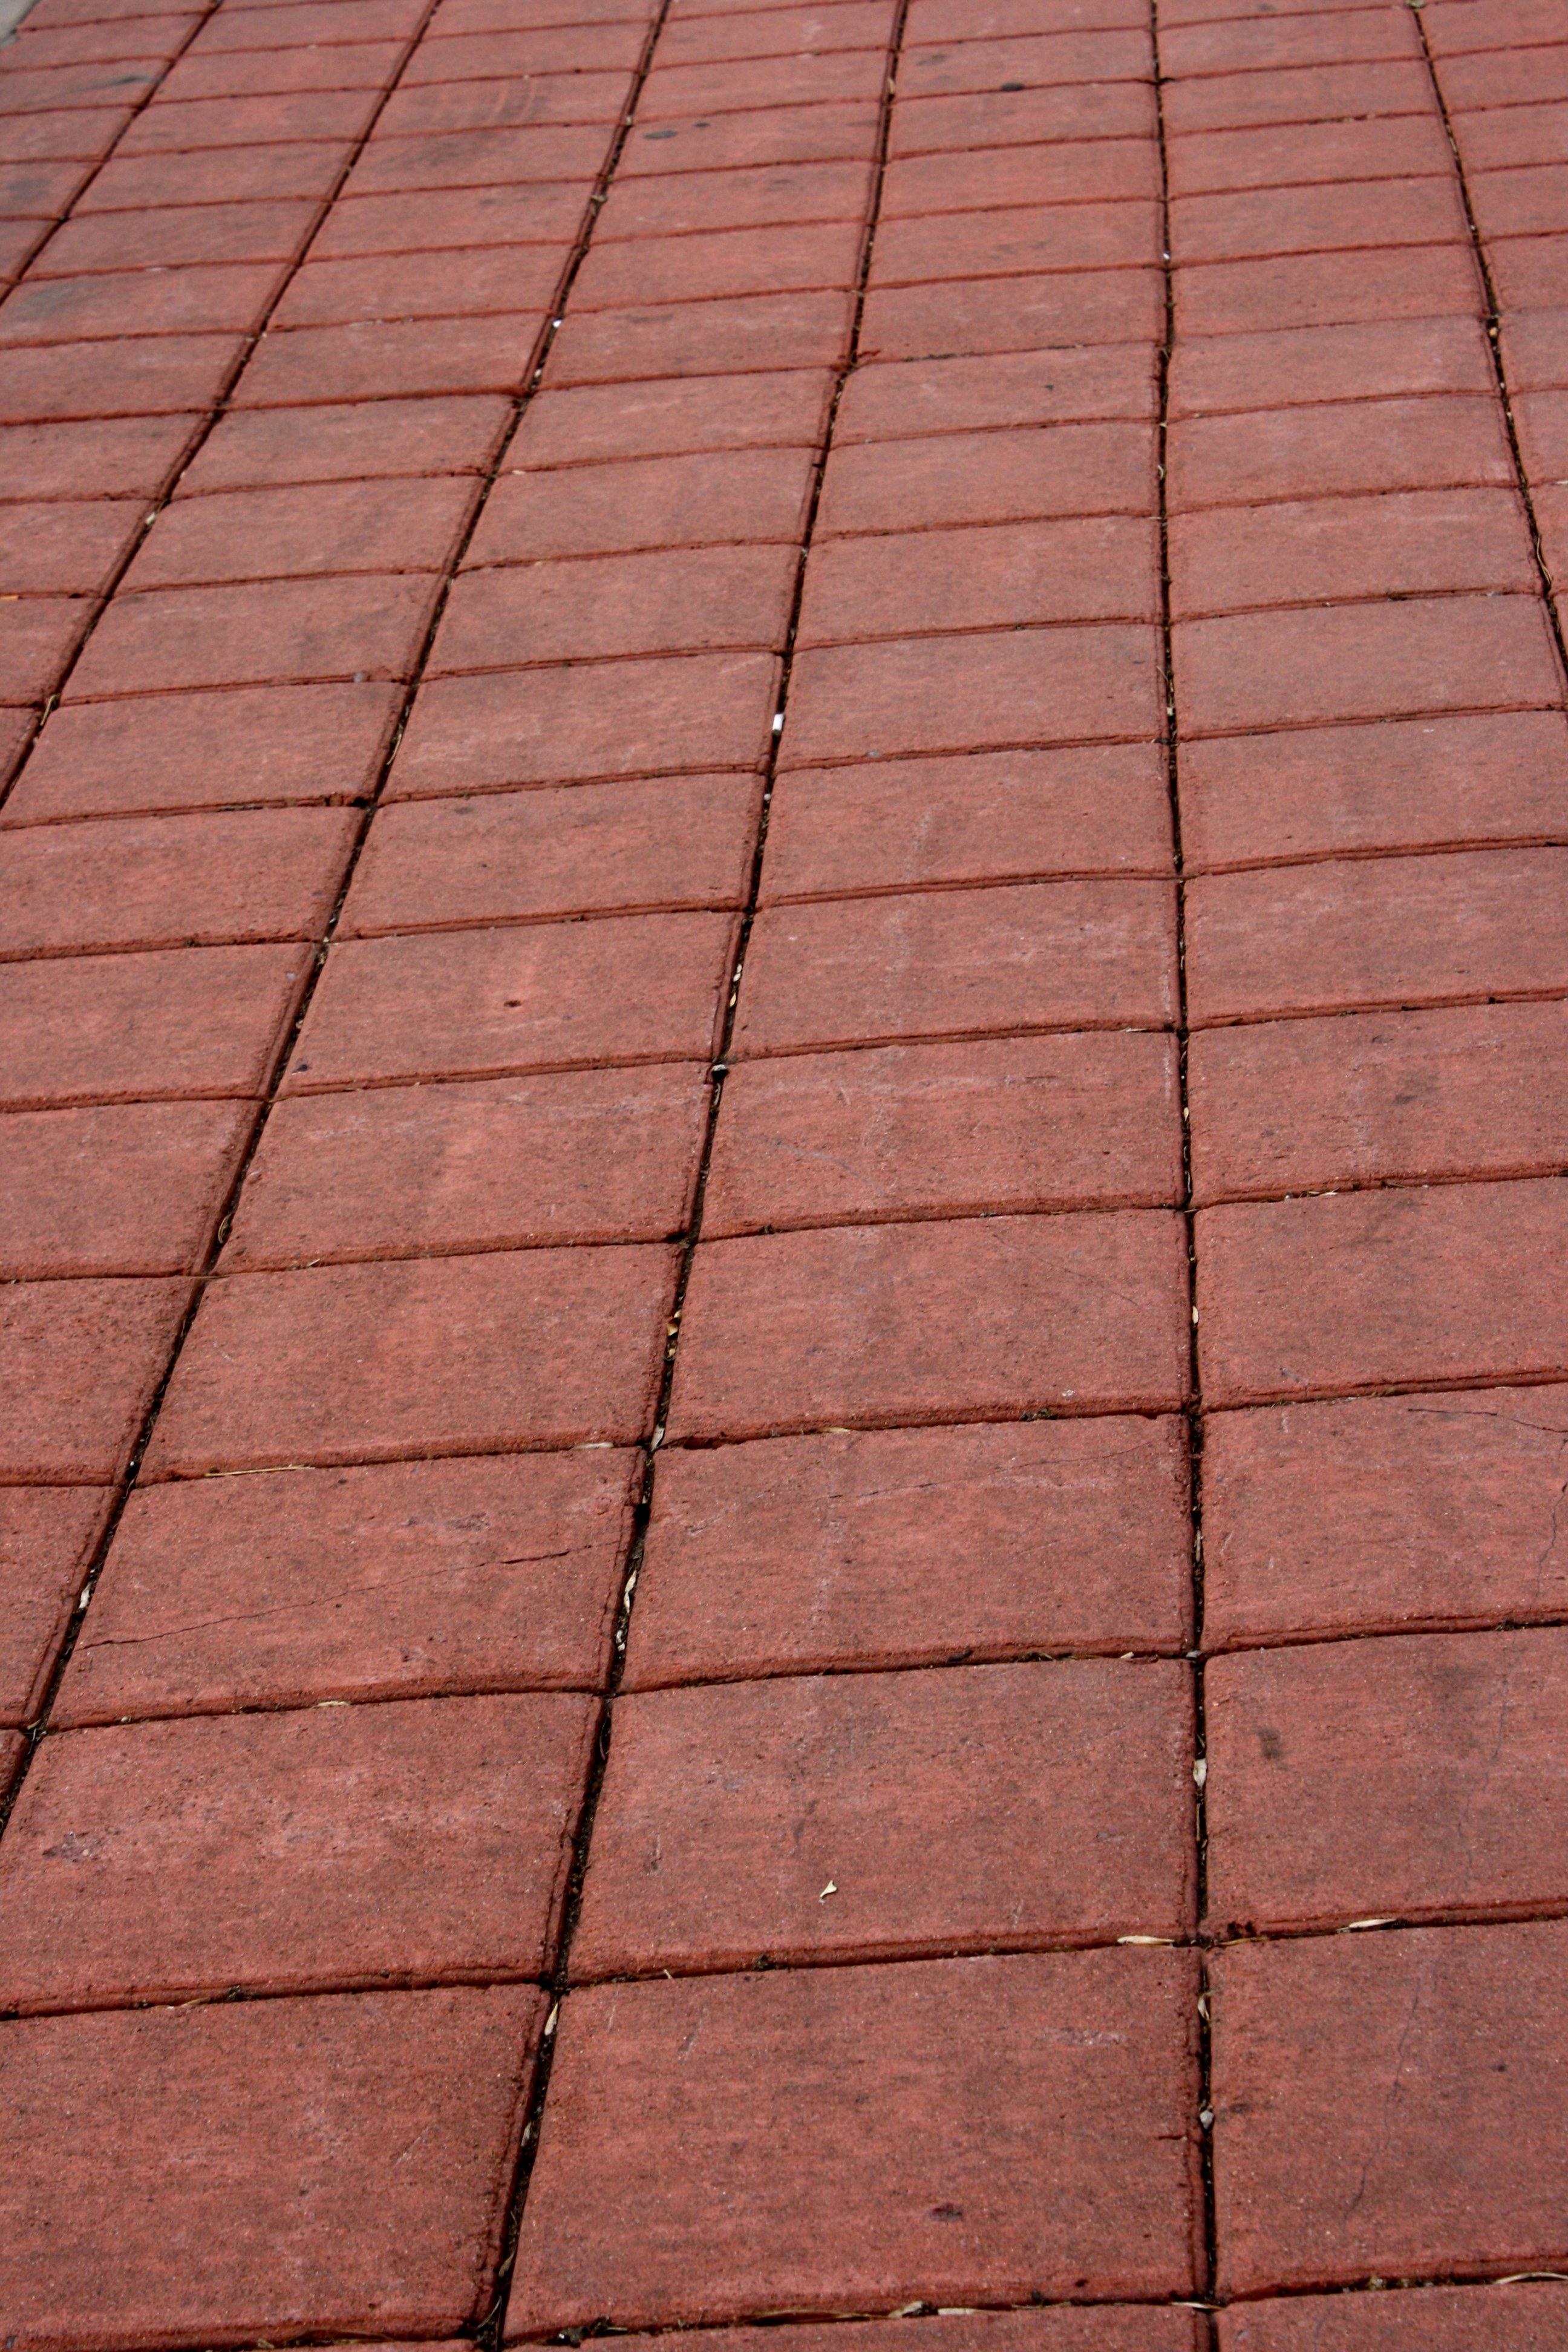 Red Pavers Sidewalk